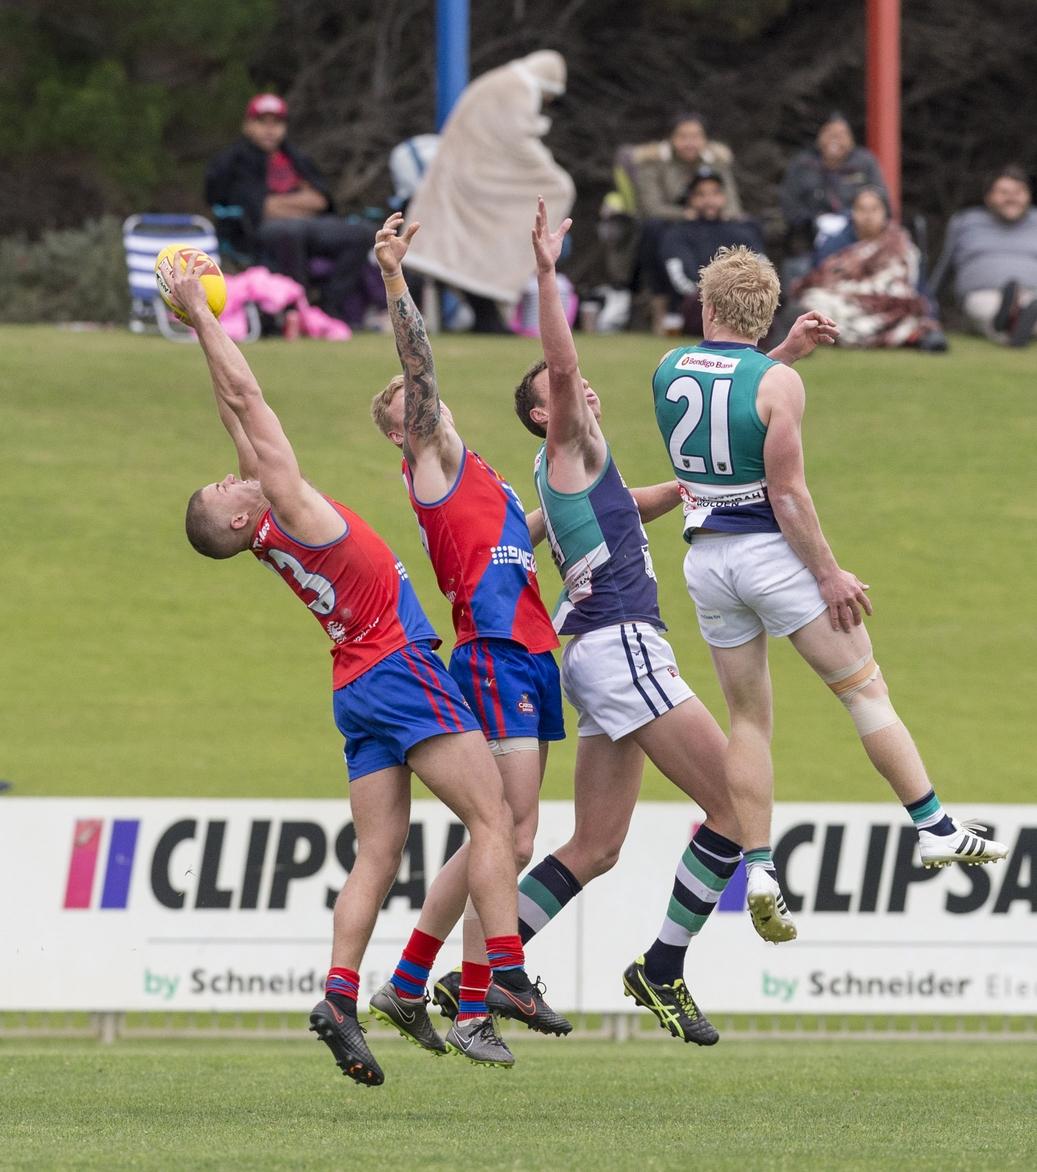 Luke Meadows takes a mark fourth in line. Picture: Dan White